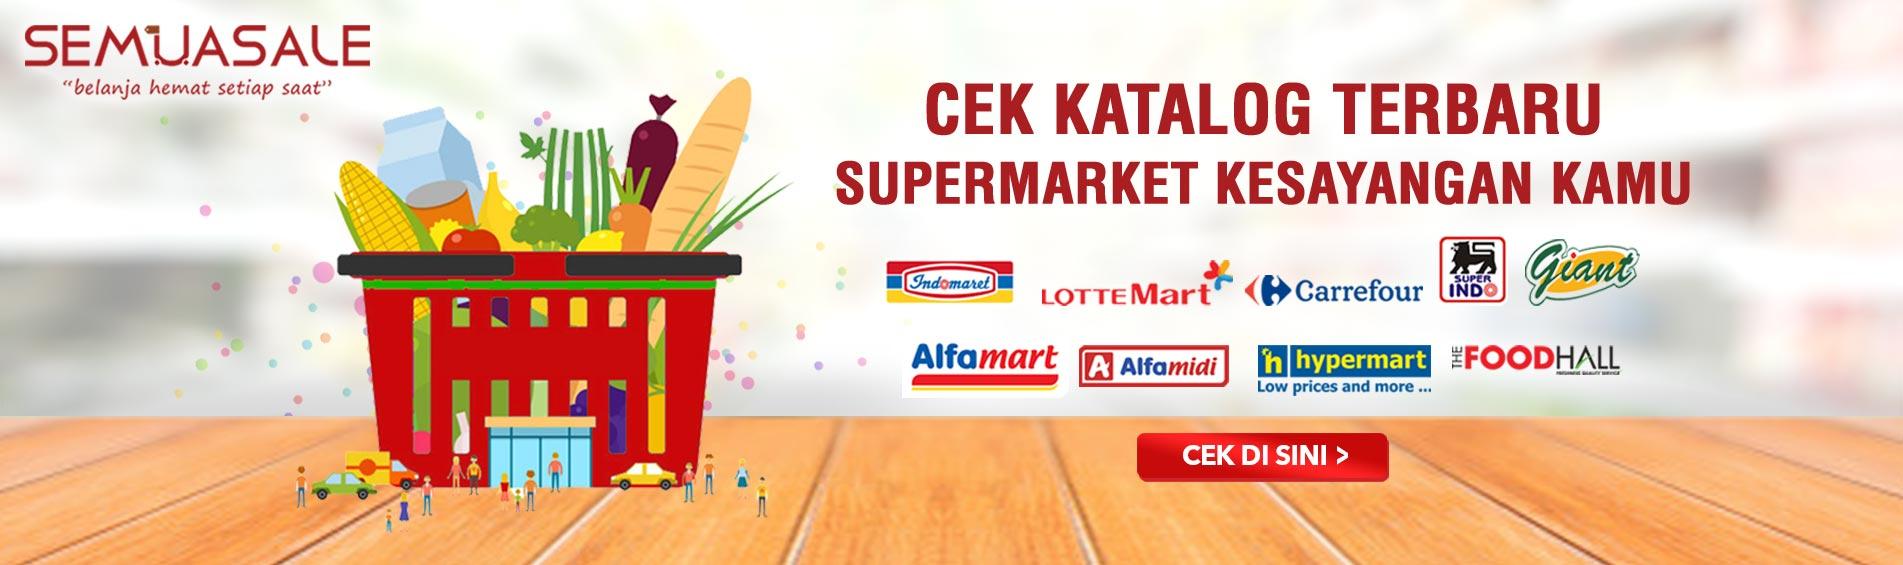 Slide katalog supermarket